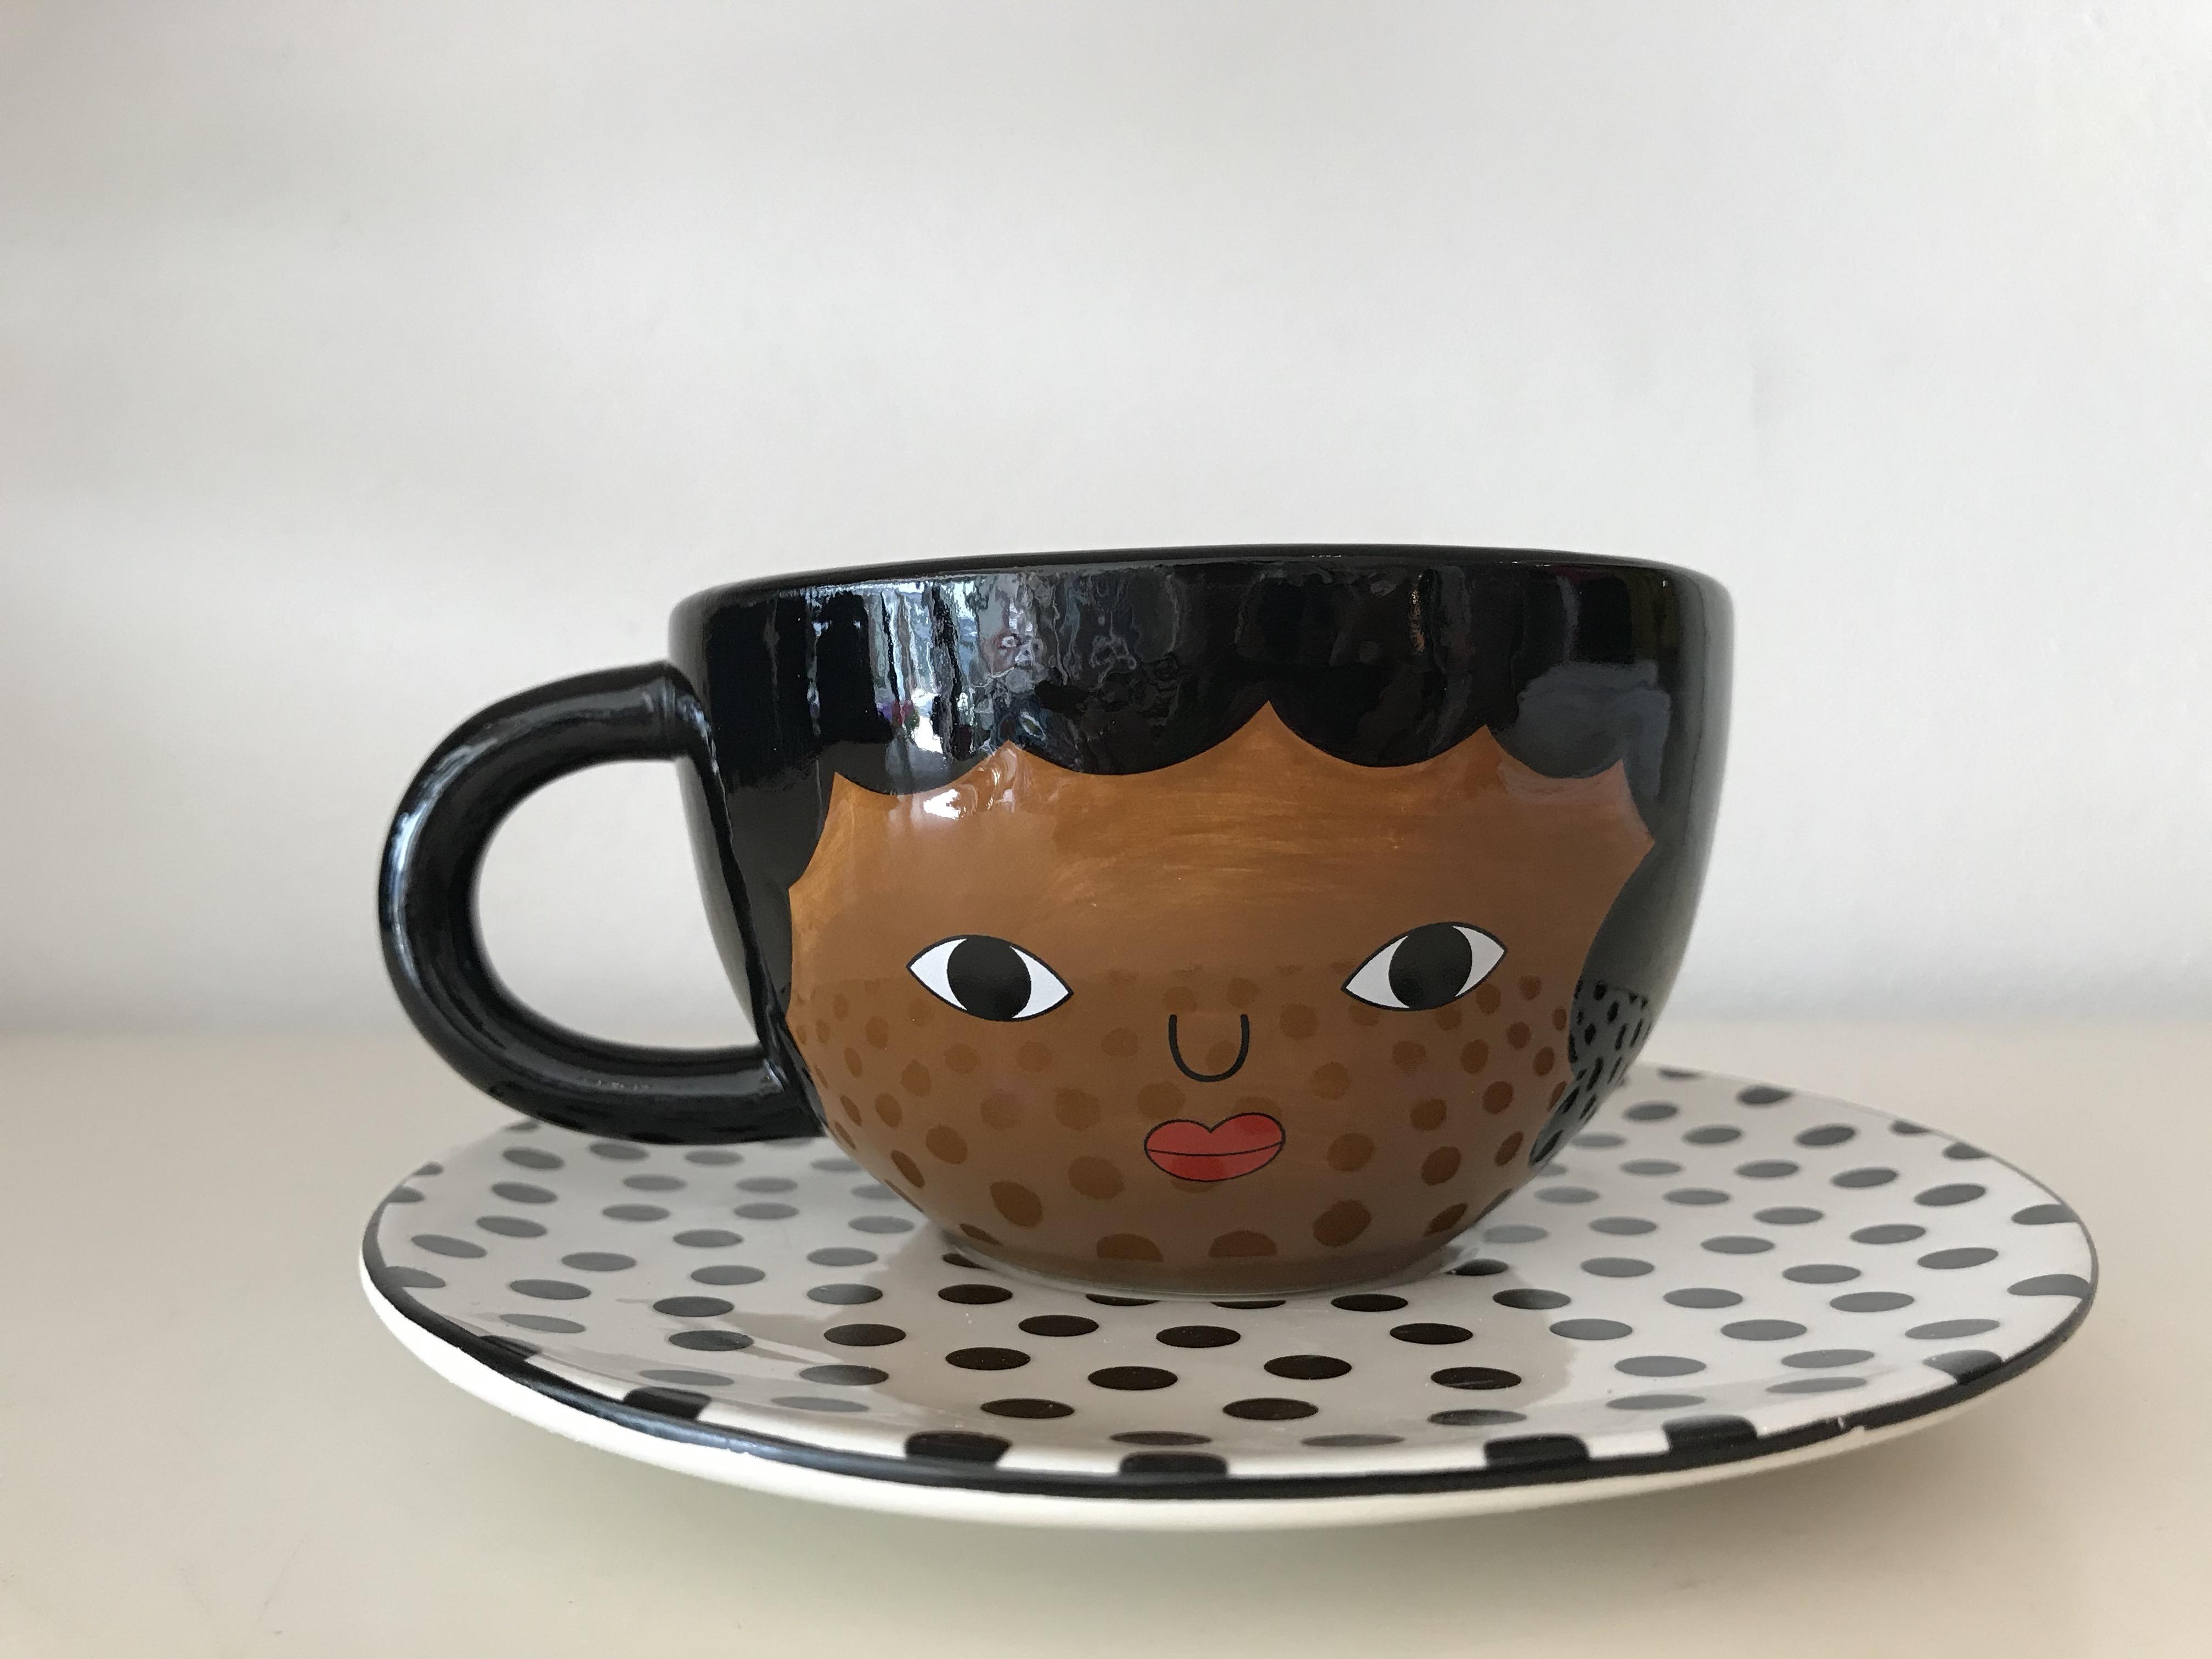 Chantelle Tea Cup and Saucer set